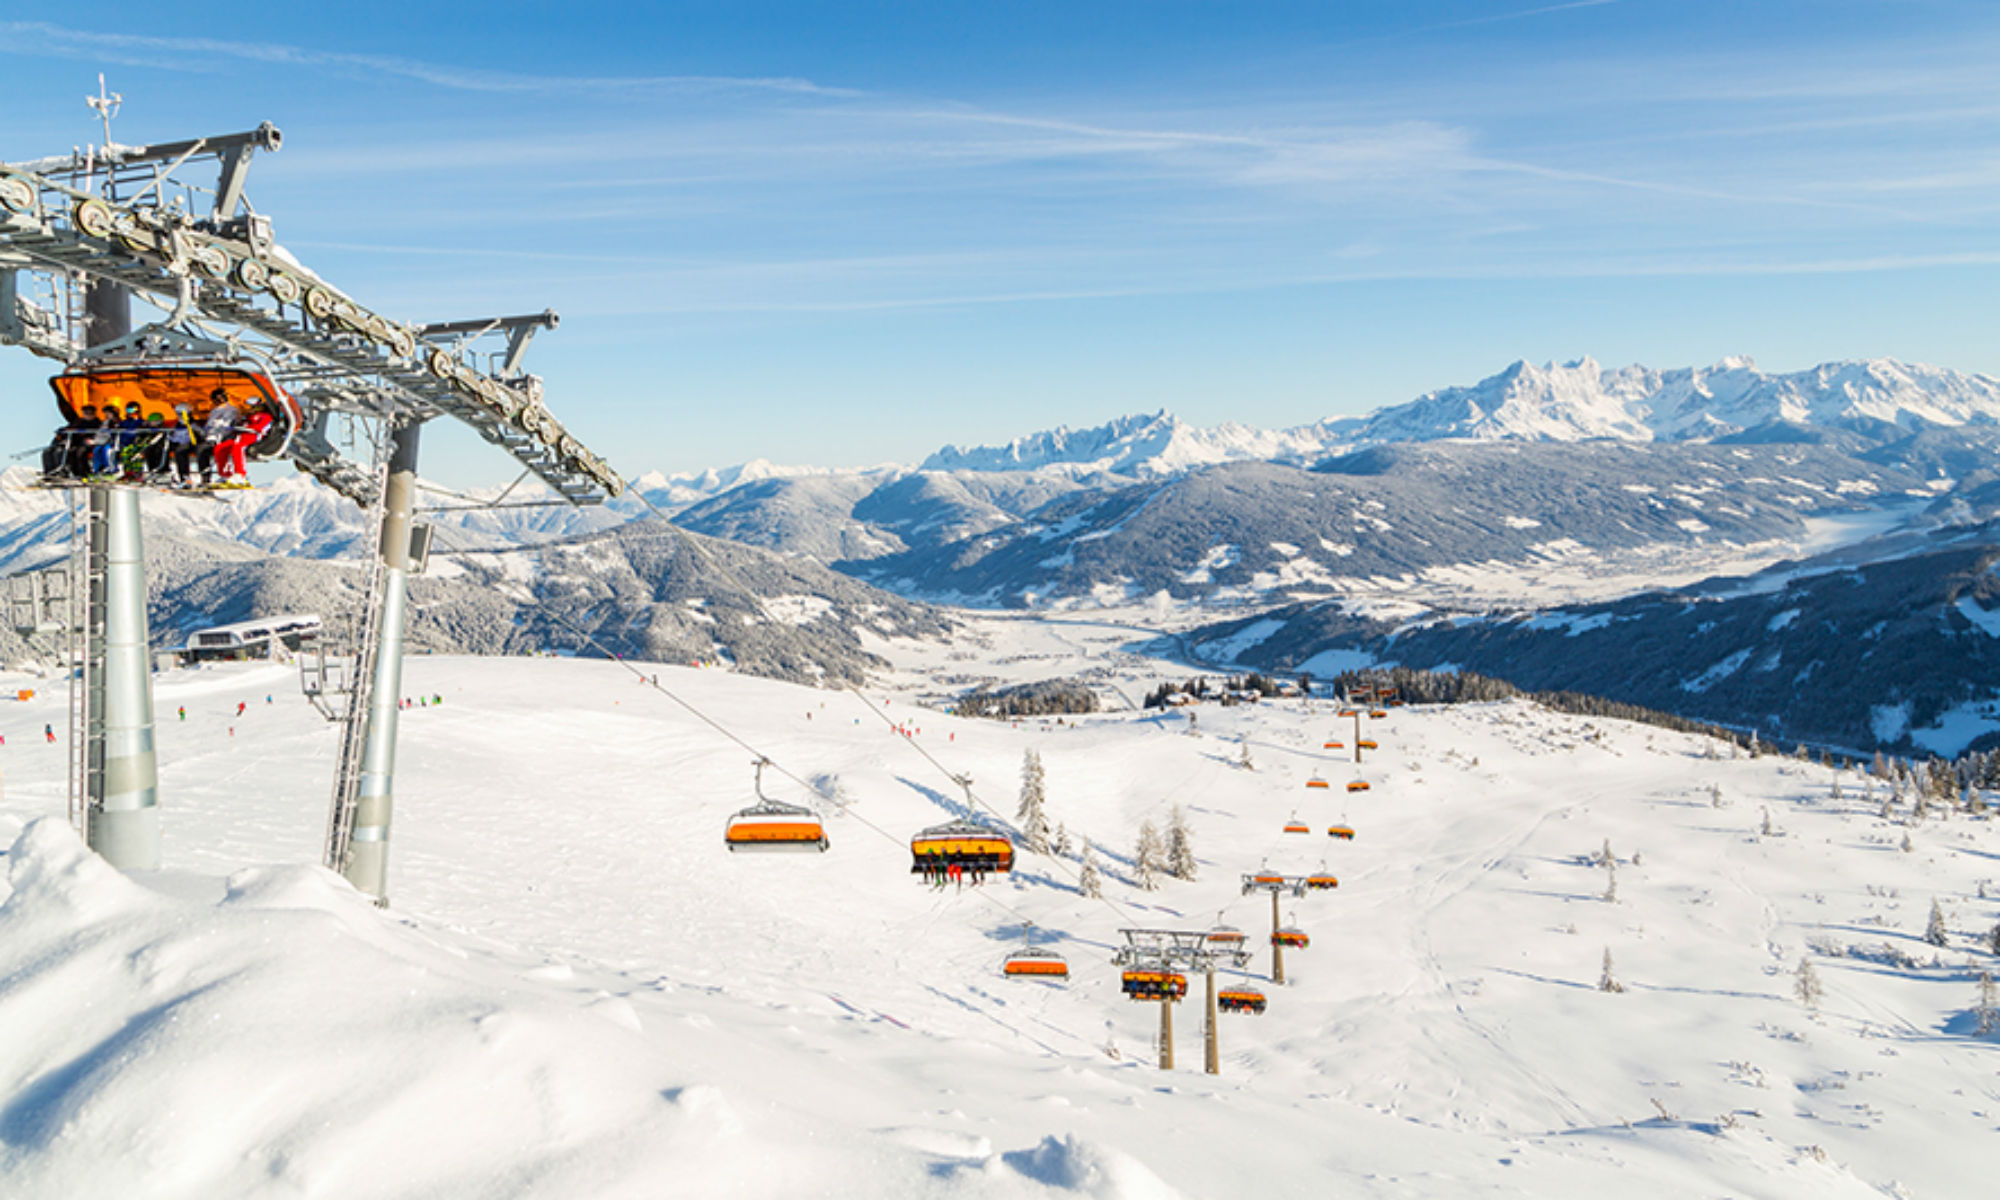 Sonnige Piste mit Skilift in Flachau.